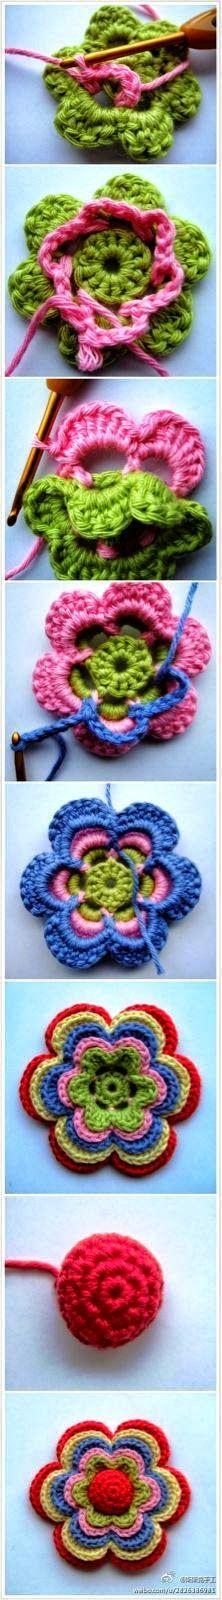 Paso a paso de flor tejida al crochet